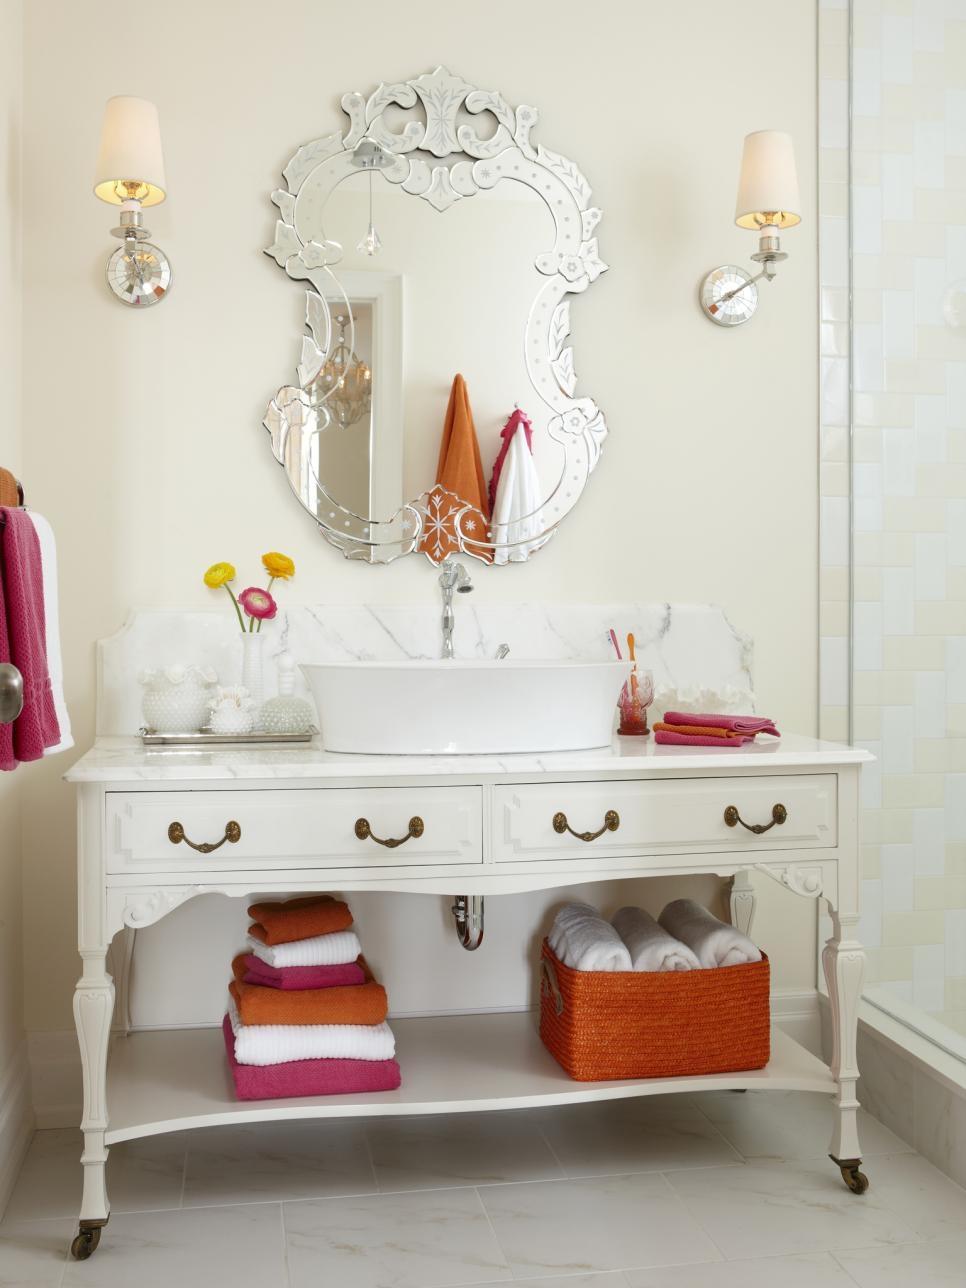 13 Dreamy Bathroom Lighting Ideas Hgtv Pertaining To Bathroom Lighting Chandeliers (View 14 of 25)